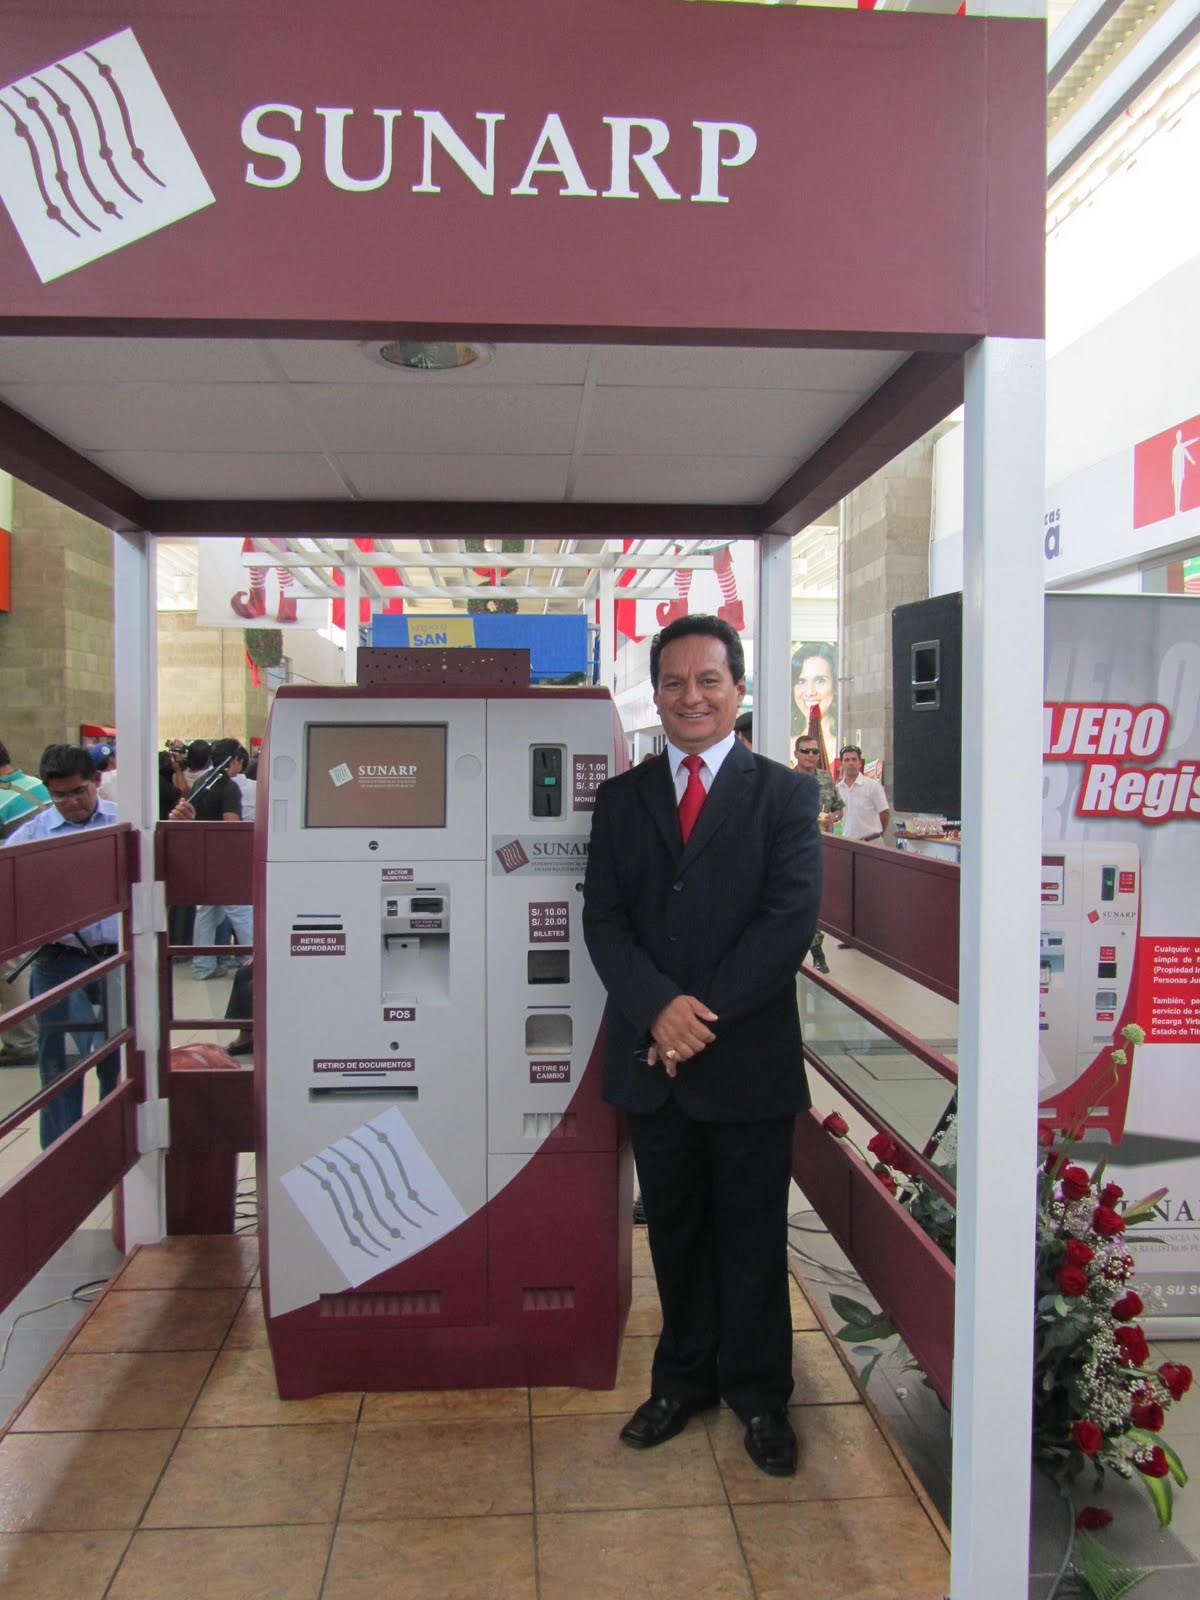 Jefe de sunarp trujillo asisti a inauguraci n de cajero for Busqueda de cajeros